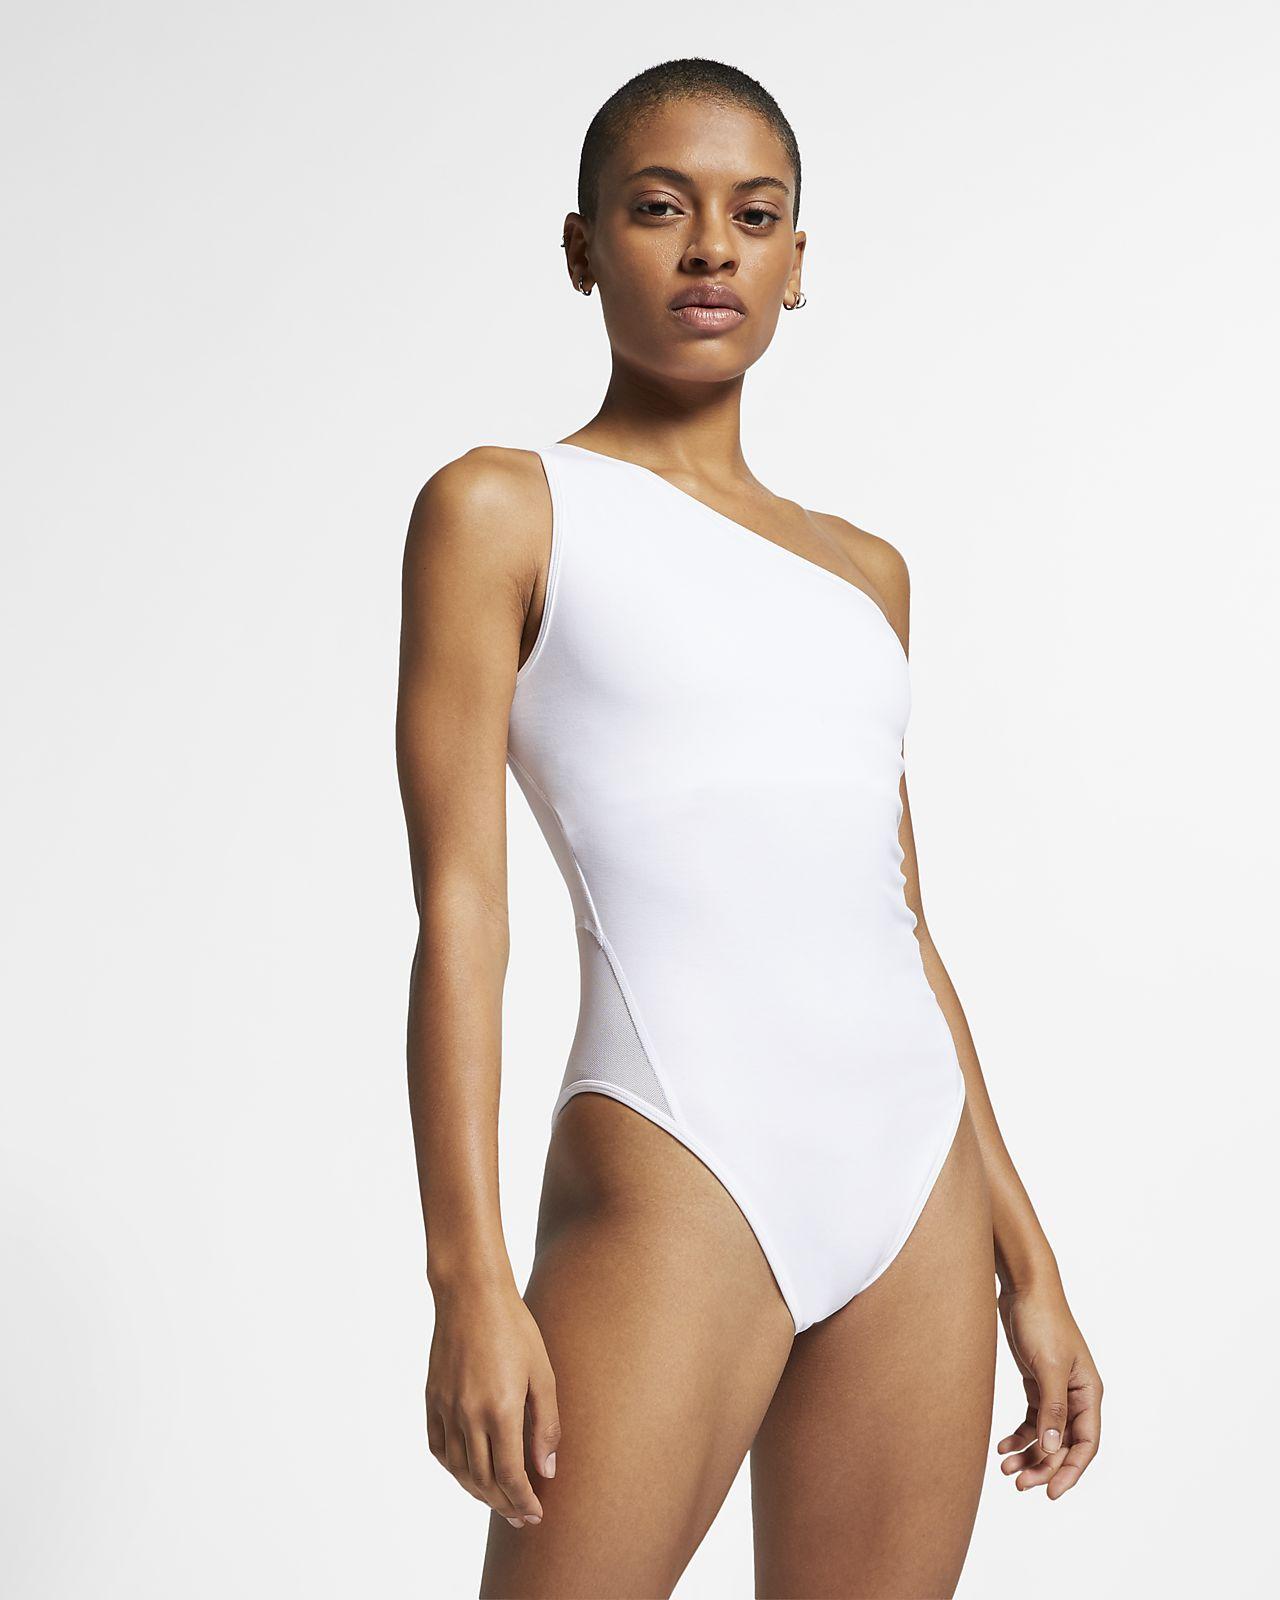 a6d661089f582 Nike Dri-FIT Women's Yoga Training Bodysuit. Nike.com